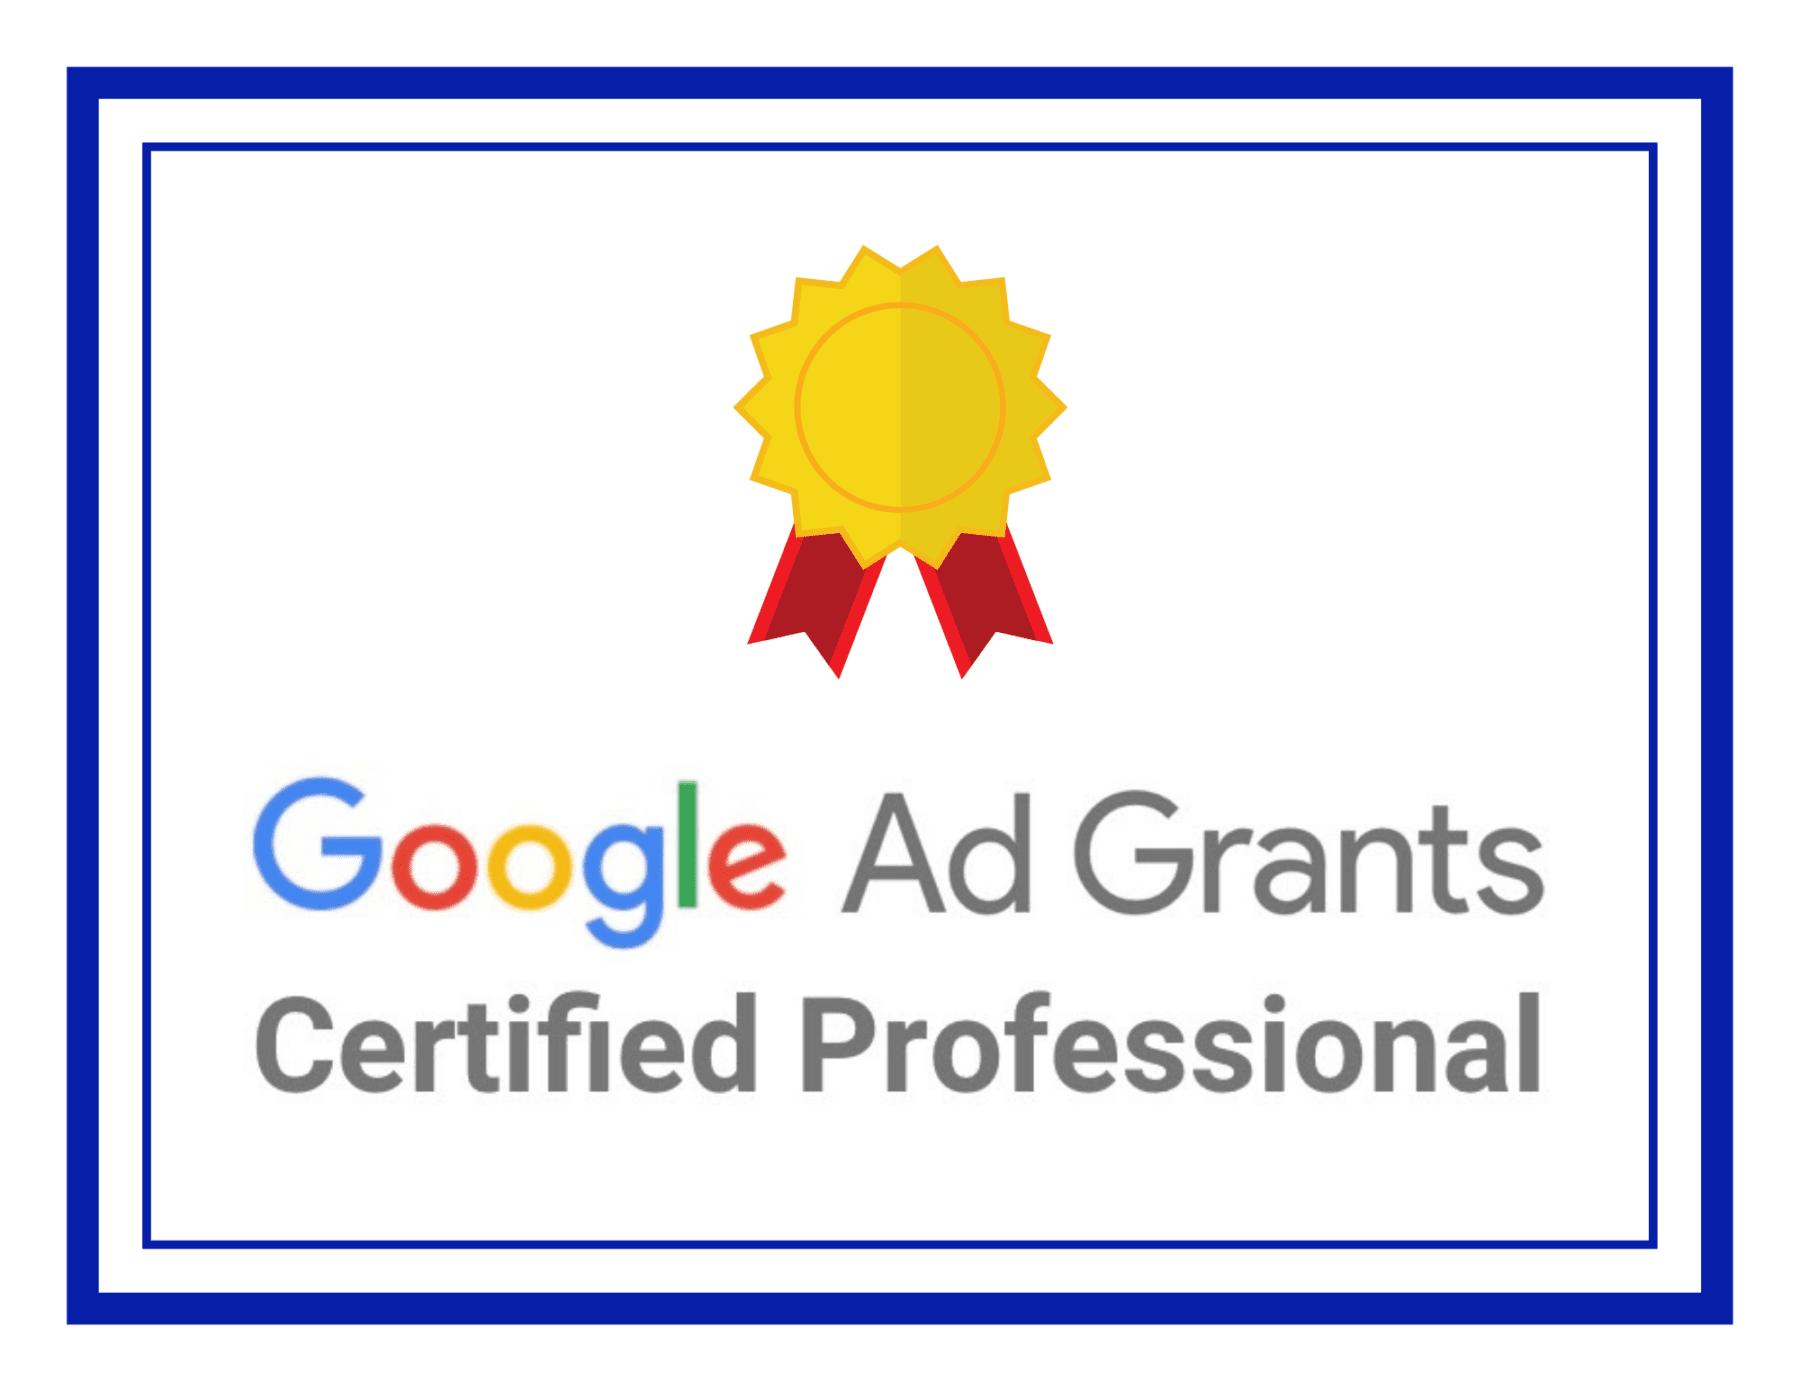 Google Ad Grant Certificate